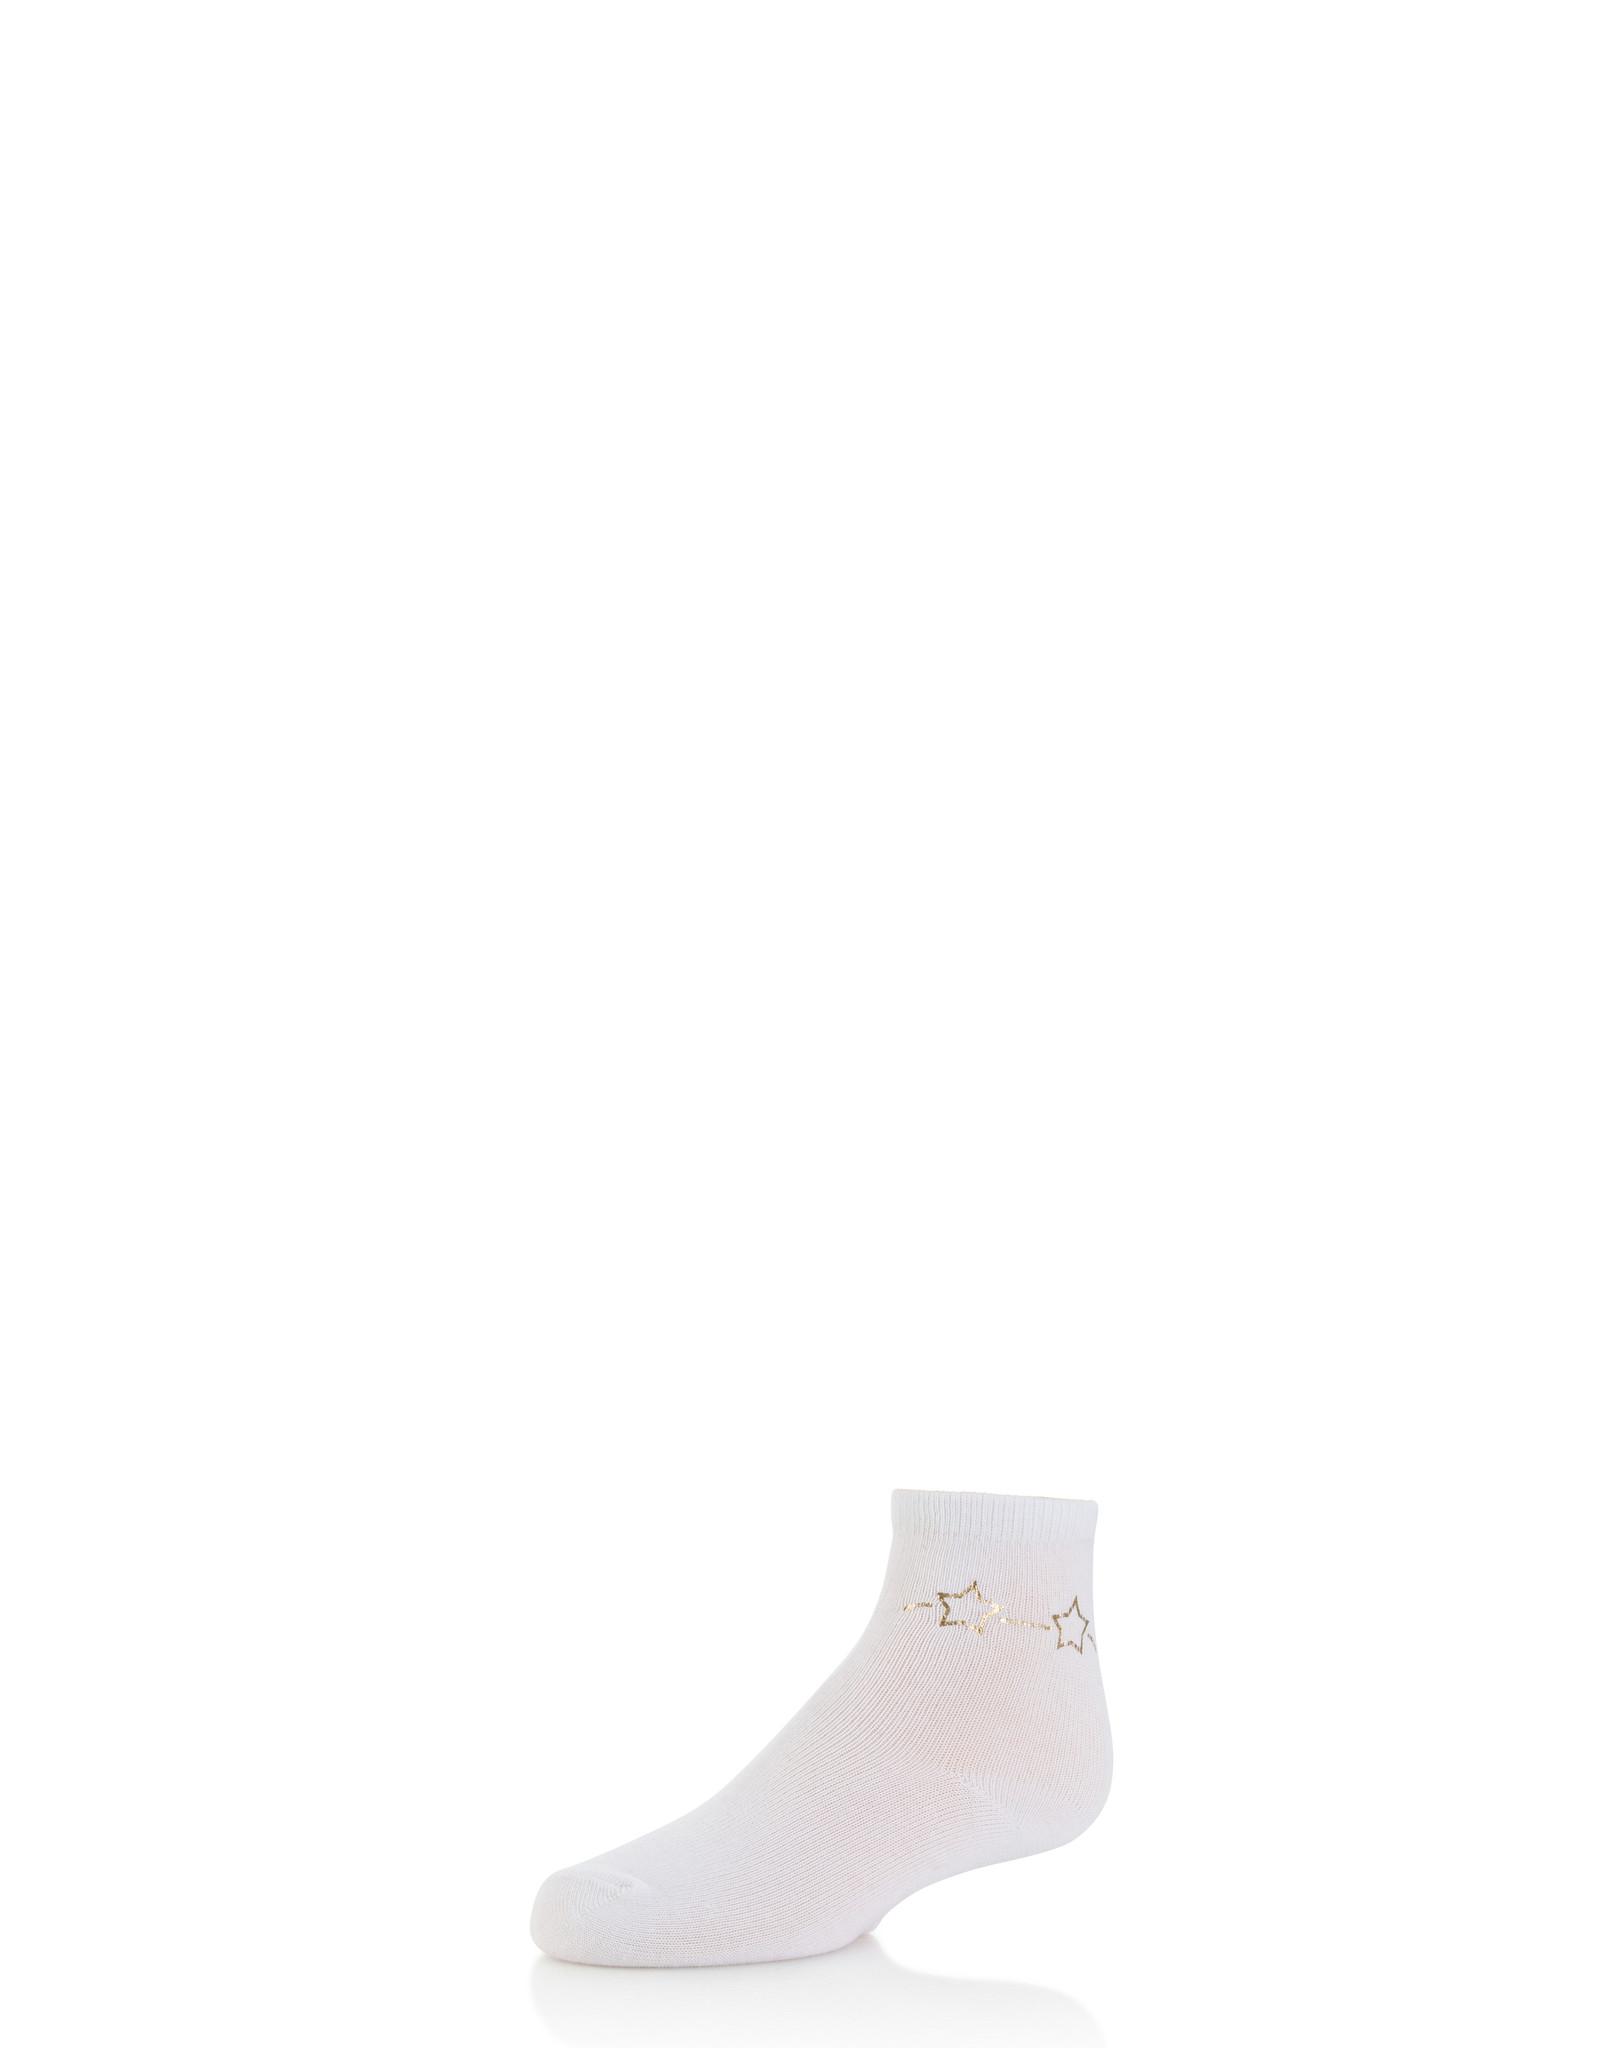 Zubii Zubii Stamped Glasses Ankle Sock